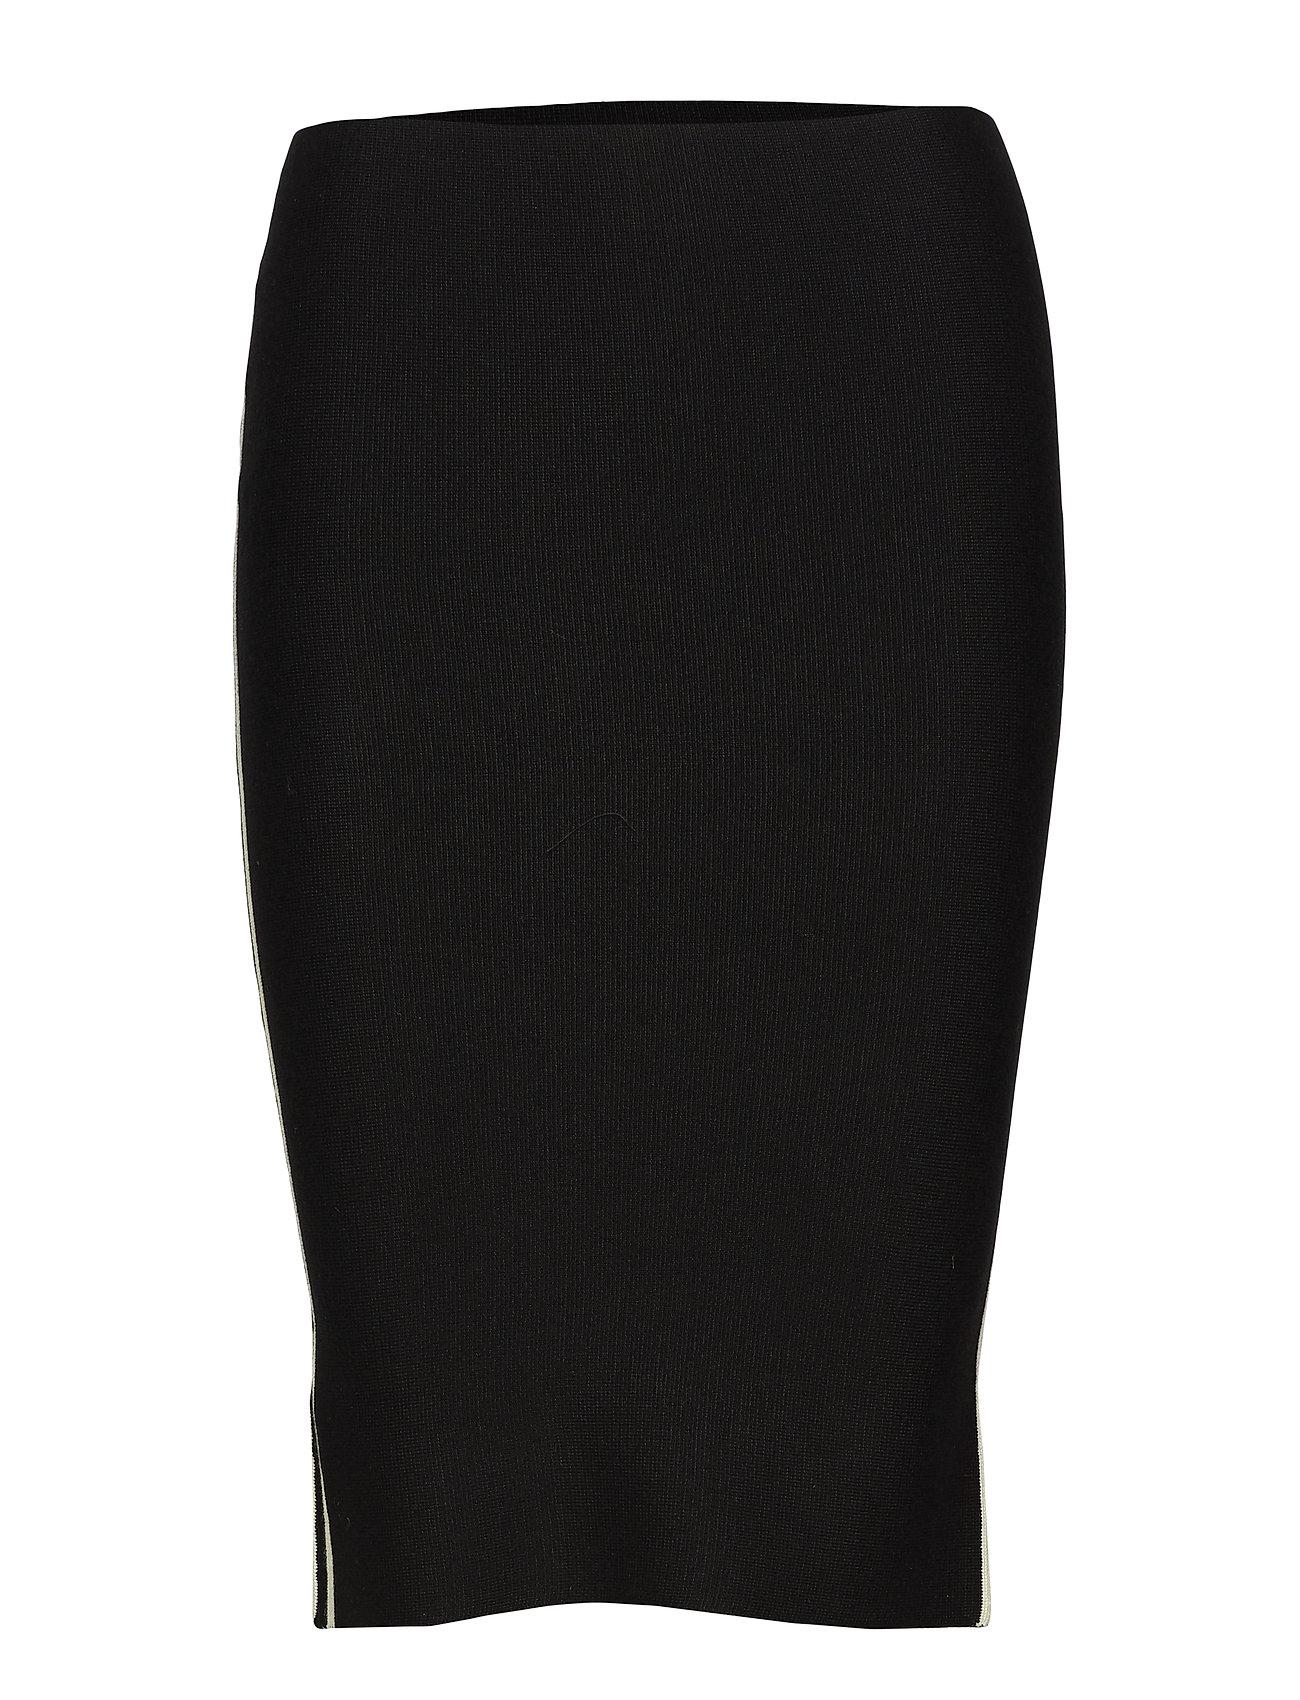 Soft Rebels Run Skirt - 001 BLACK